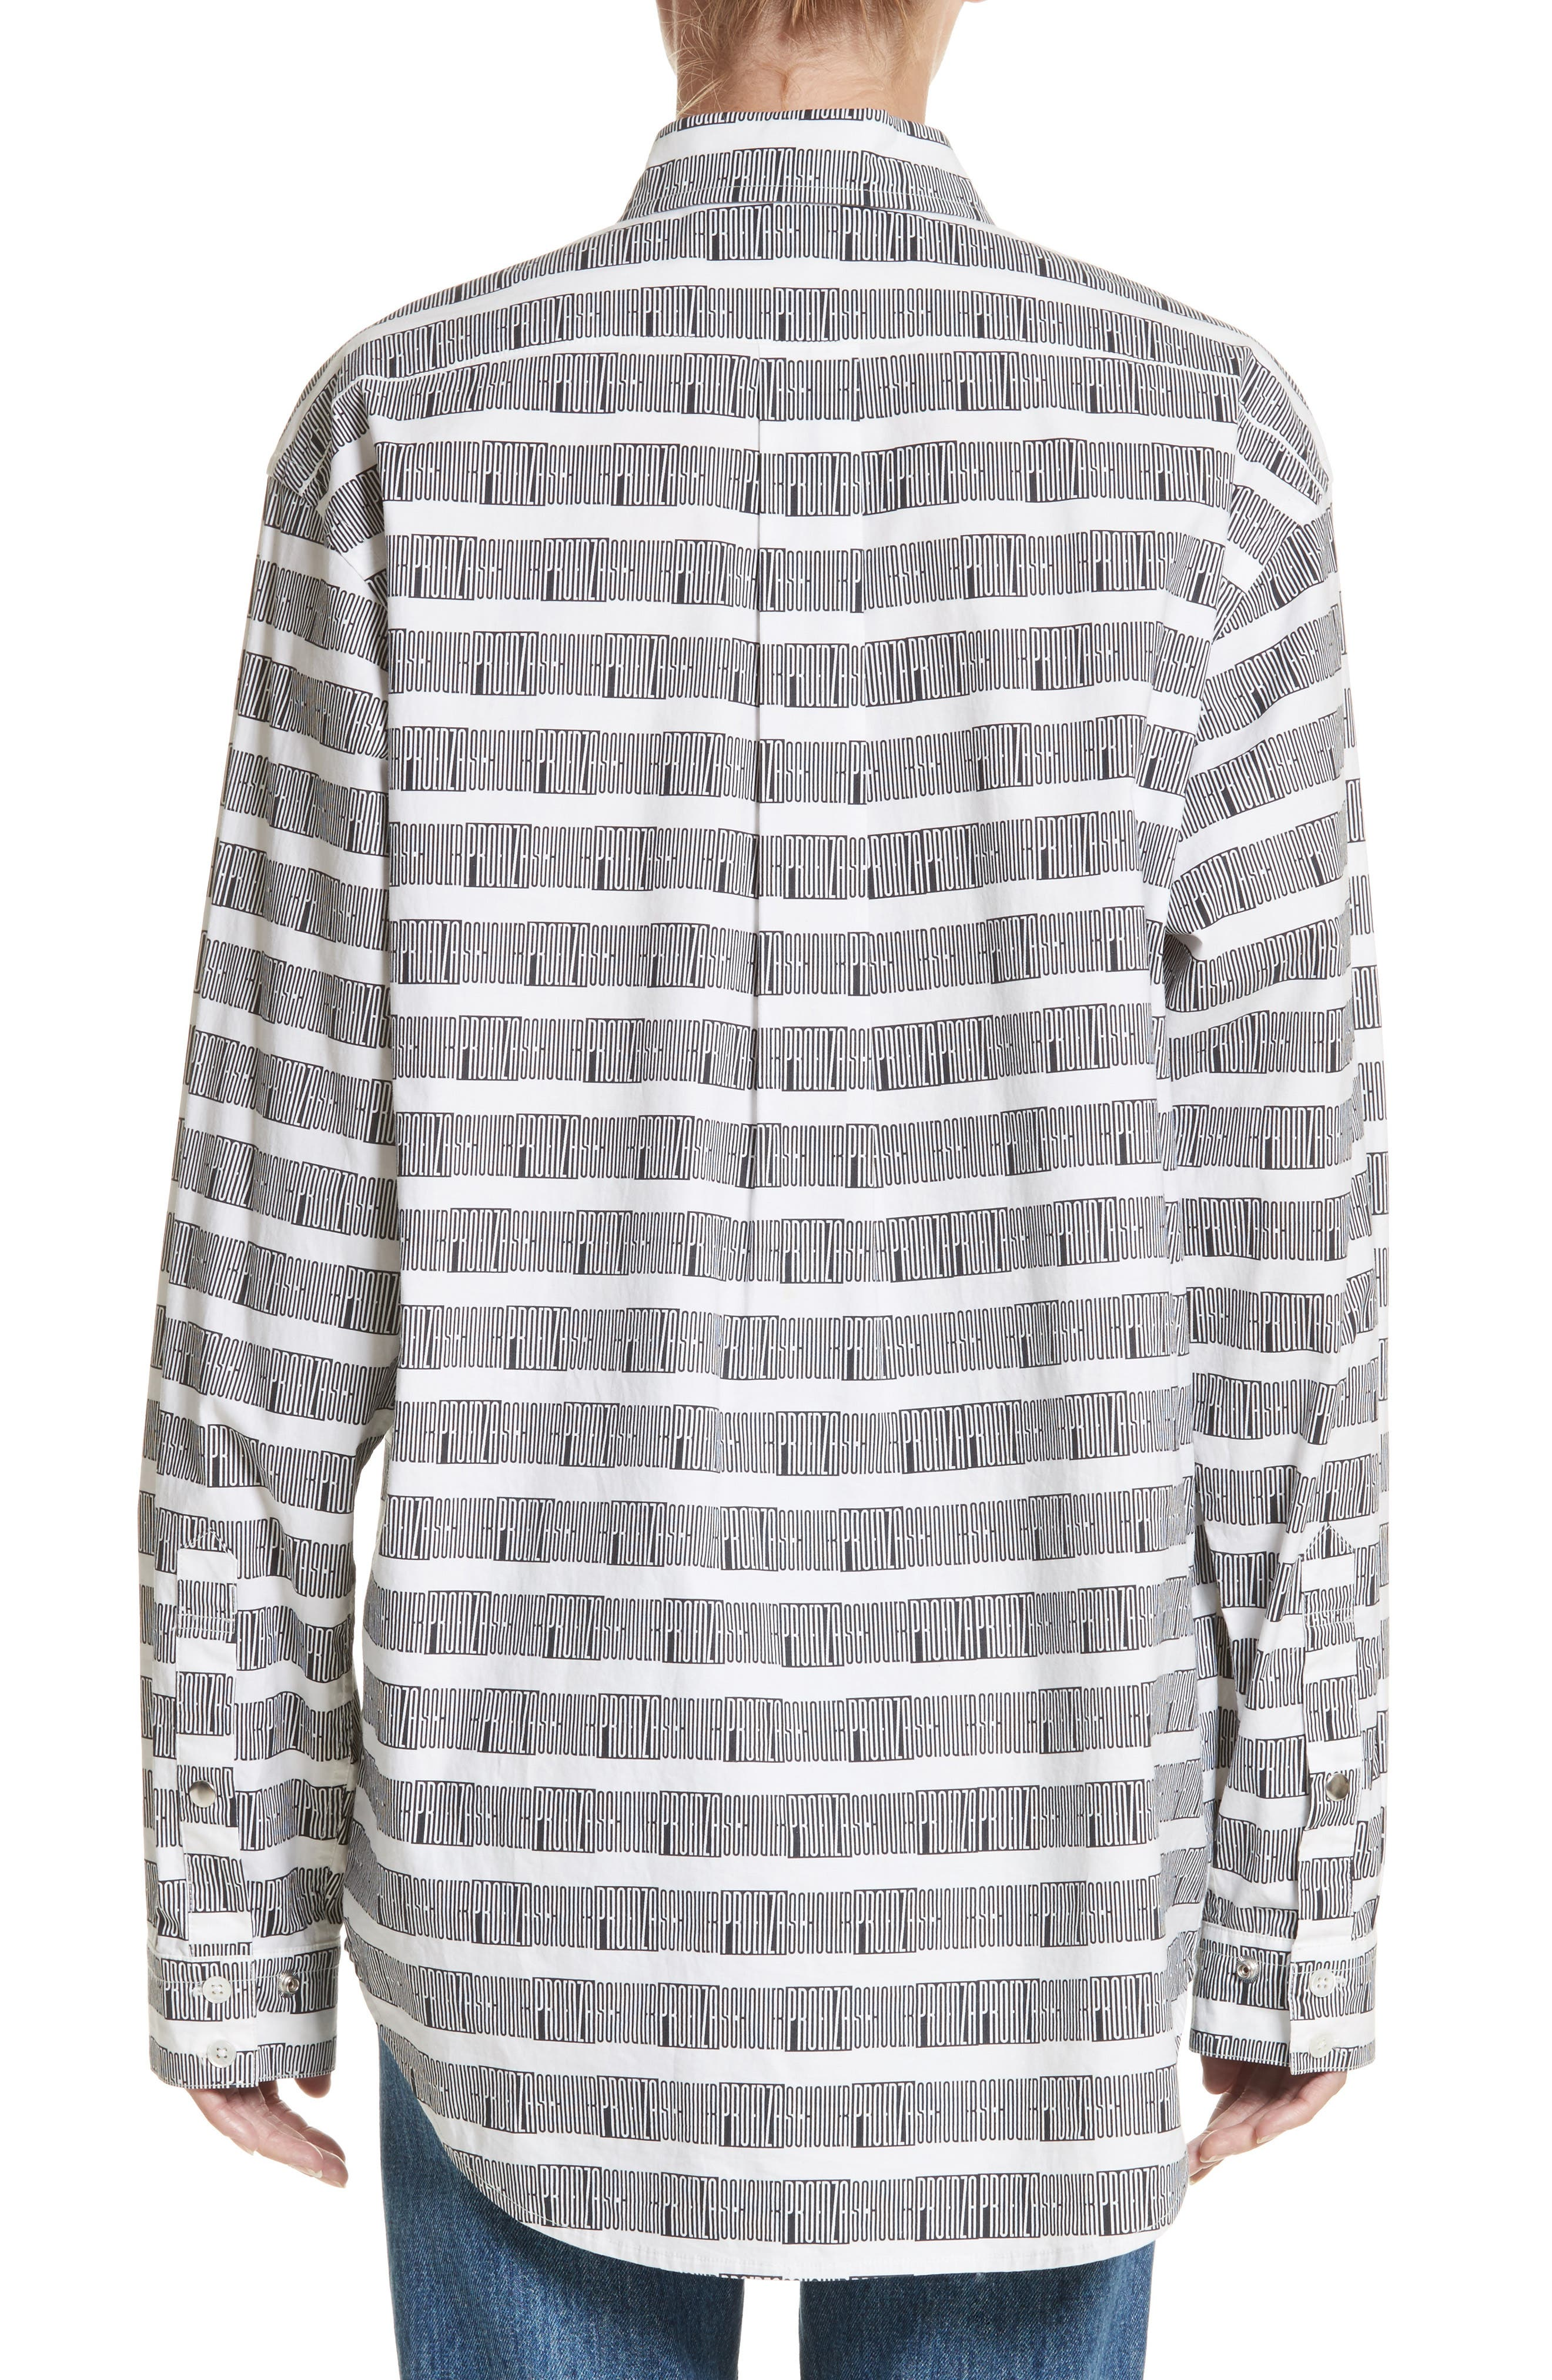 Alternate Image 3  - Proenza Schouler PSWL Graphic Stripe Cotton Top